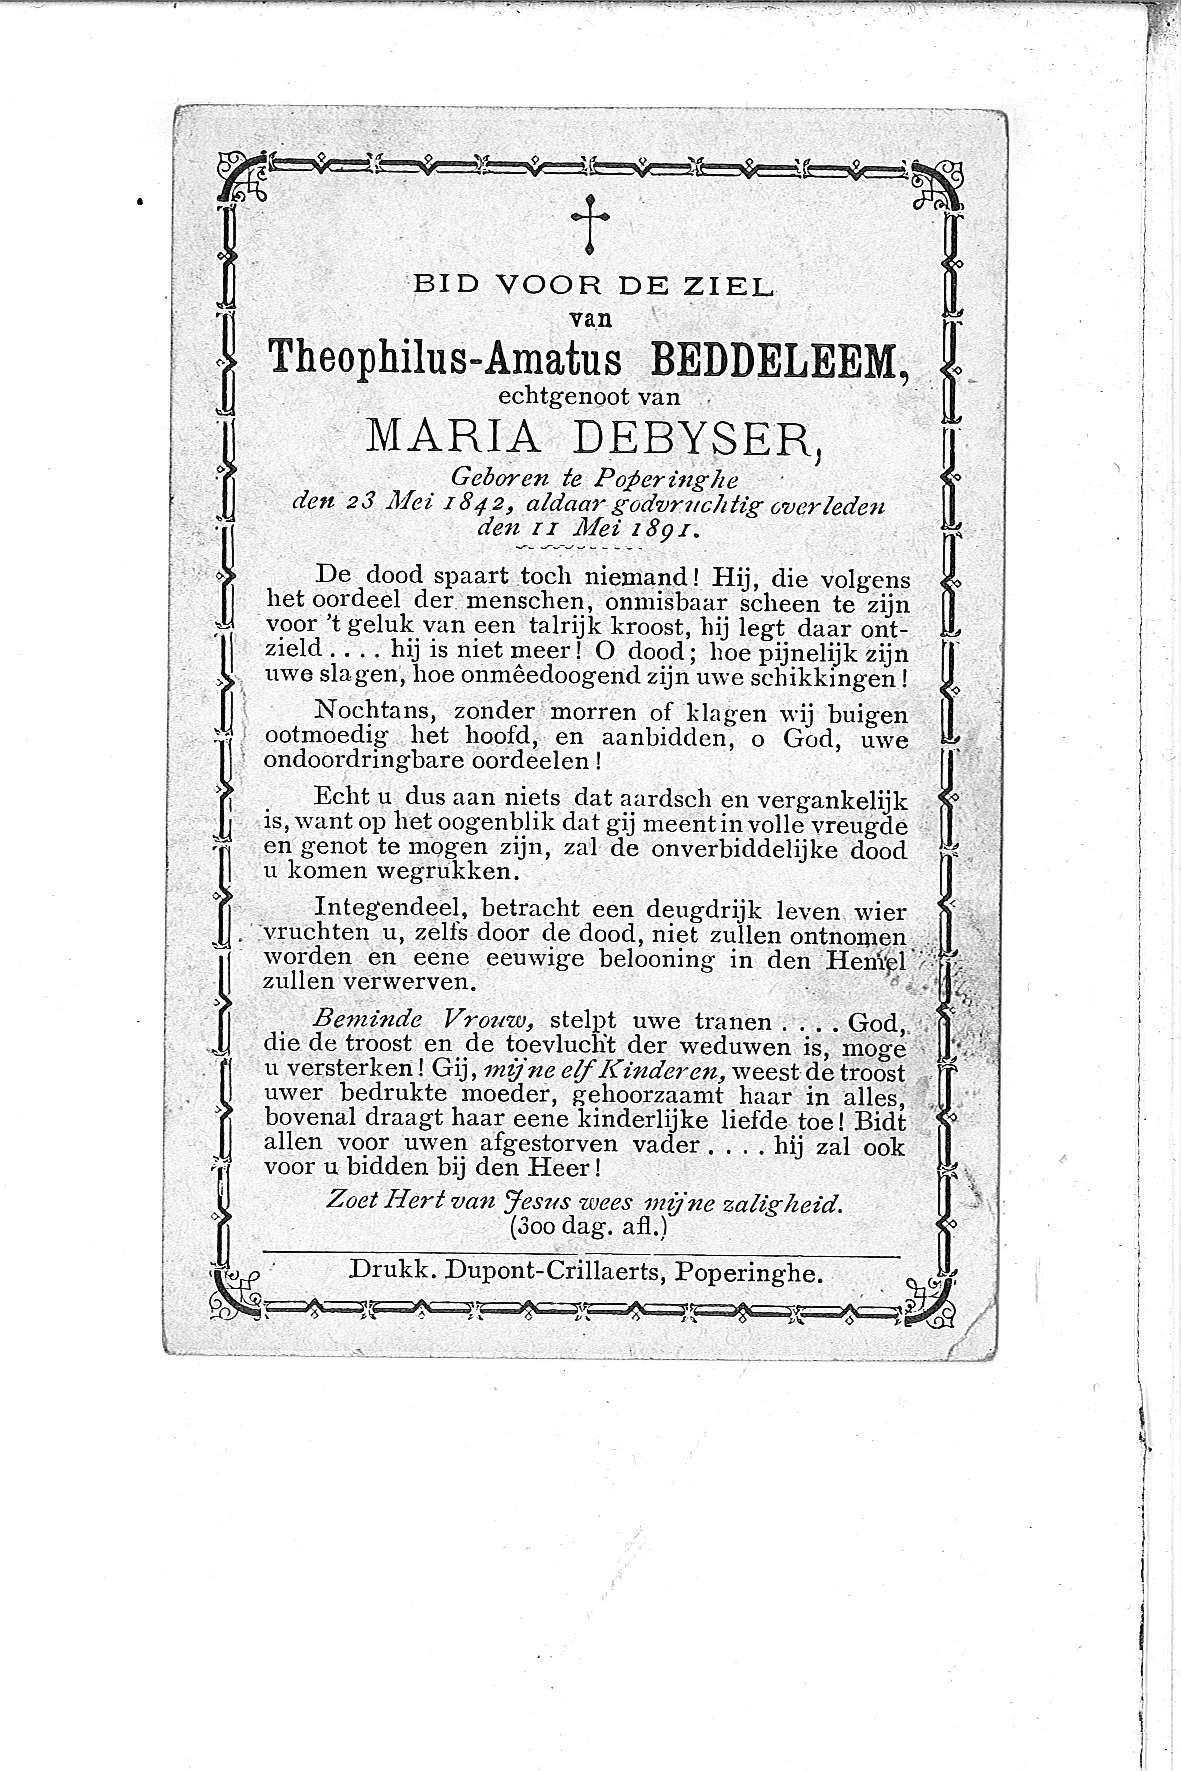 Theophilus-Amatus(1891)20101125100742_00029.jpg